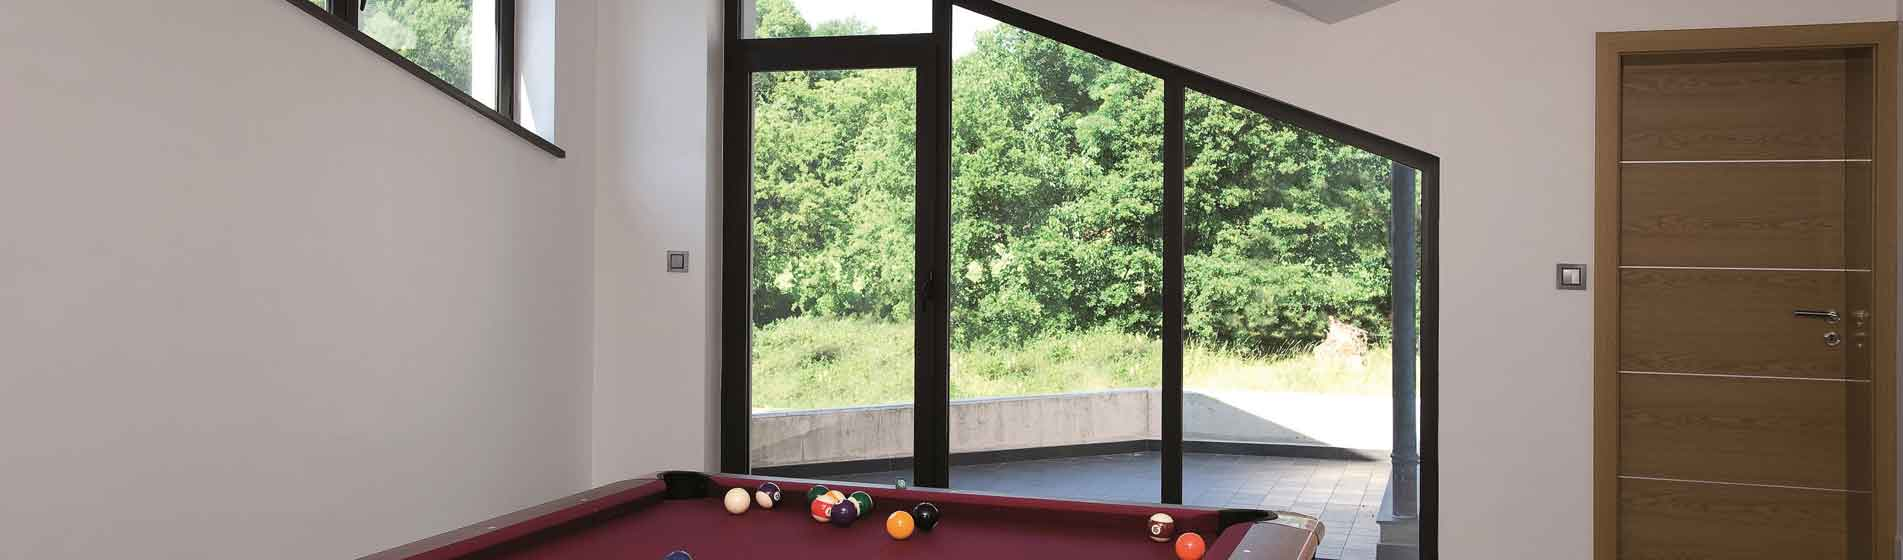 acheter porte fenêtre alu 13 Bouches-du-Rhône